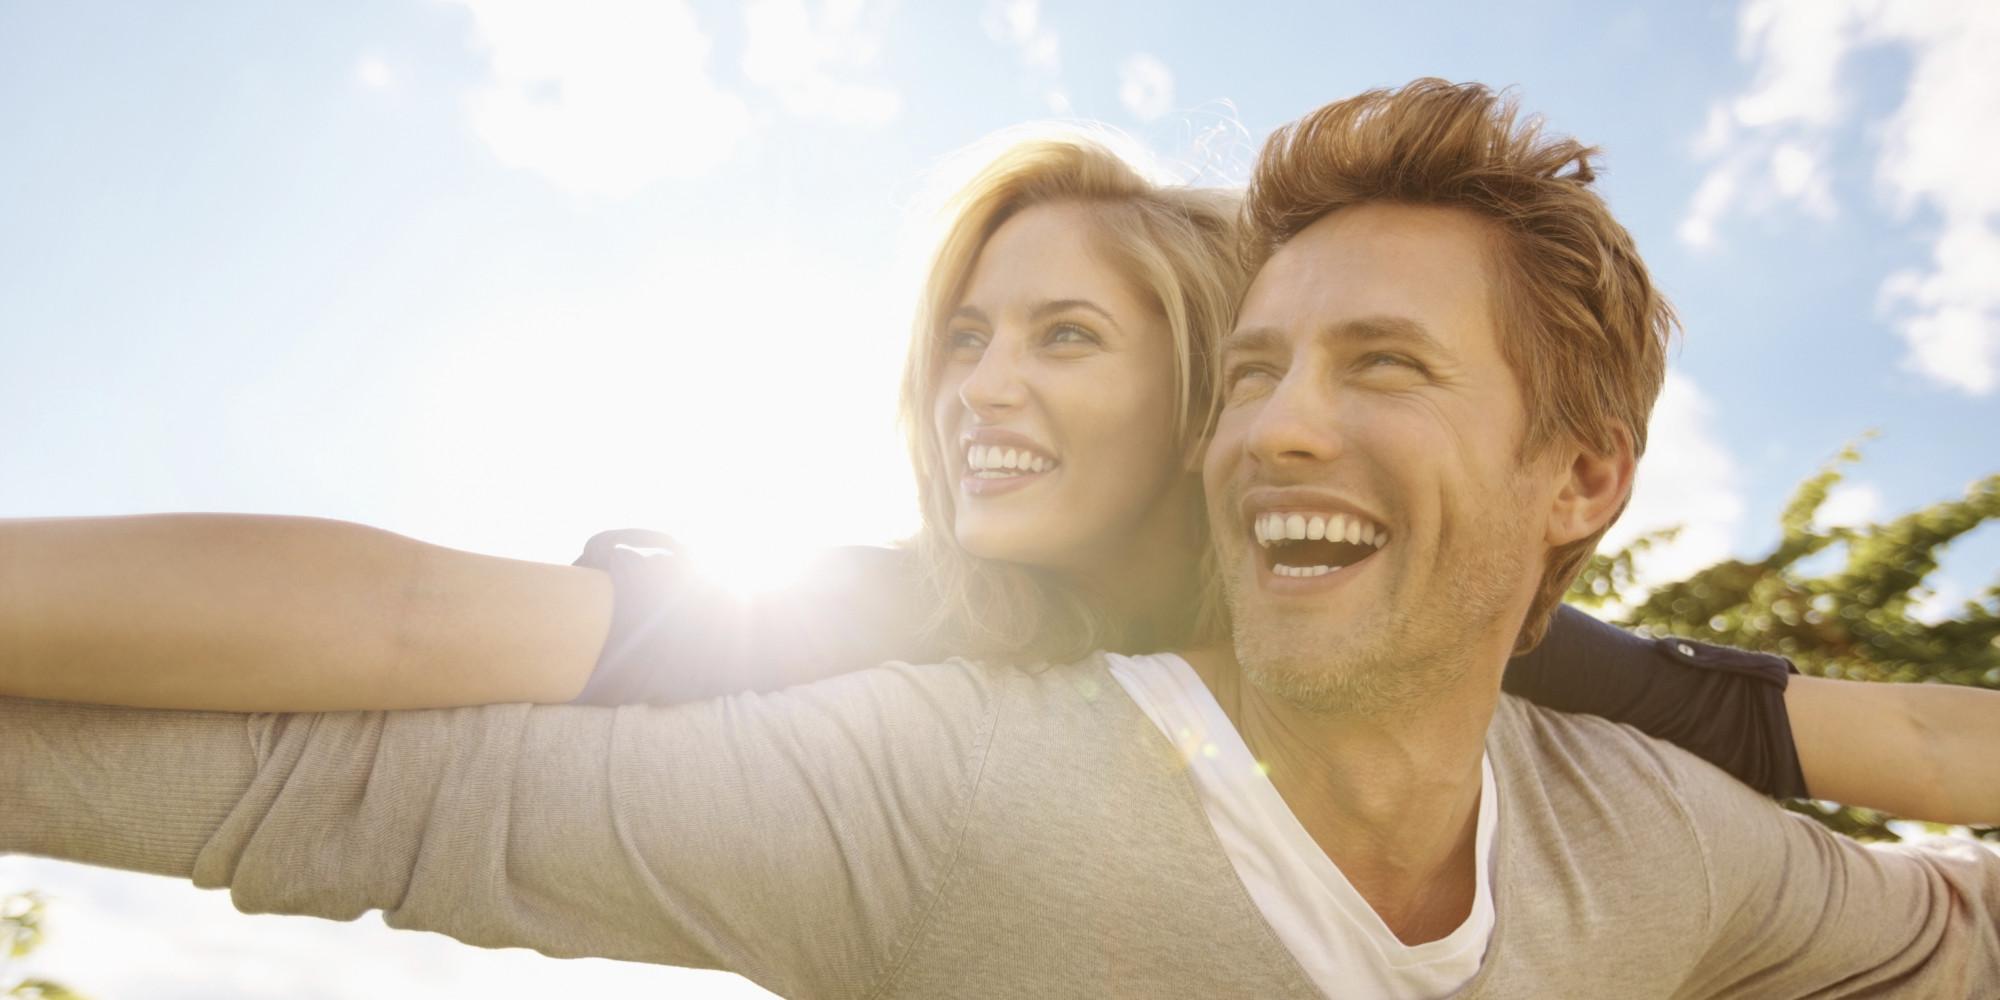 o-HAPPY-COUPLE-facebook Jika 11 Tanda Ini Ada Pada Sang Suami, Berarti Dia adalah Sahabat Terbaikmu Juga. Cek di Sini, Yuk!